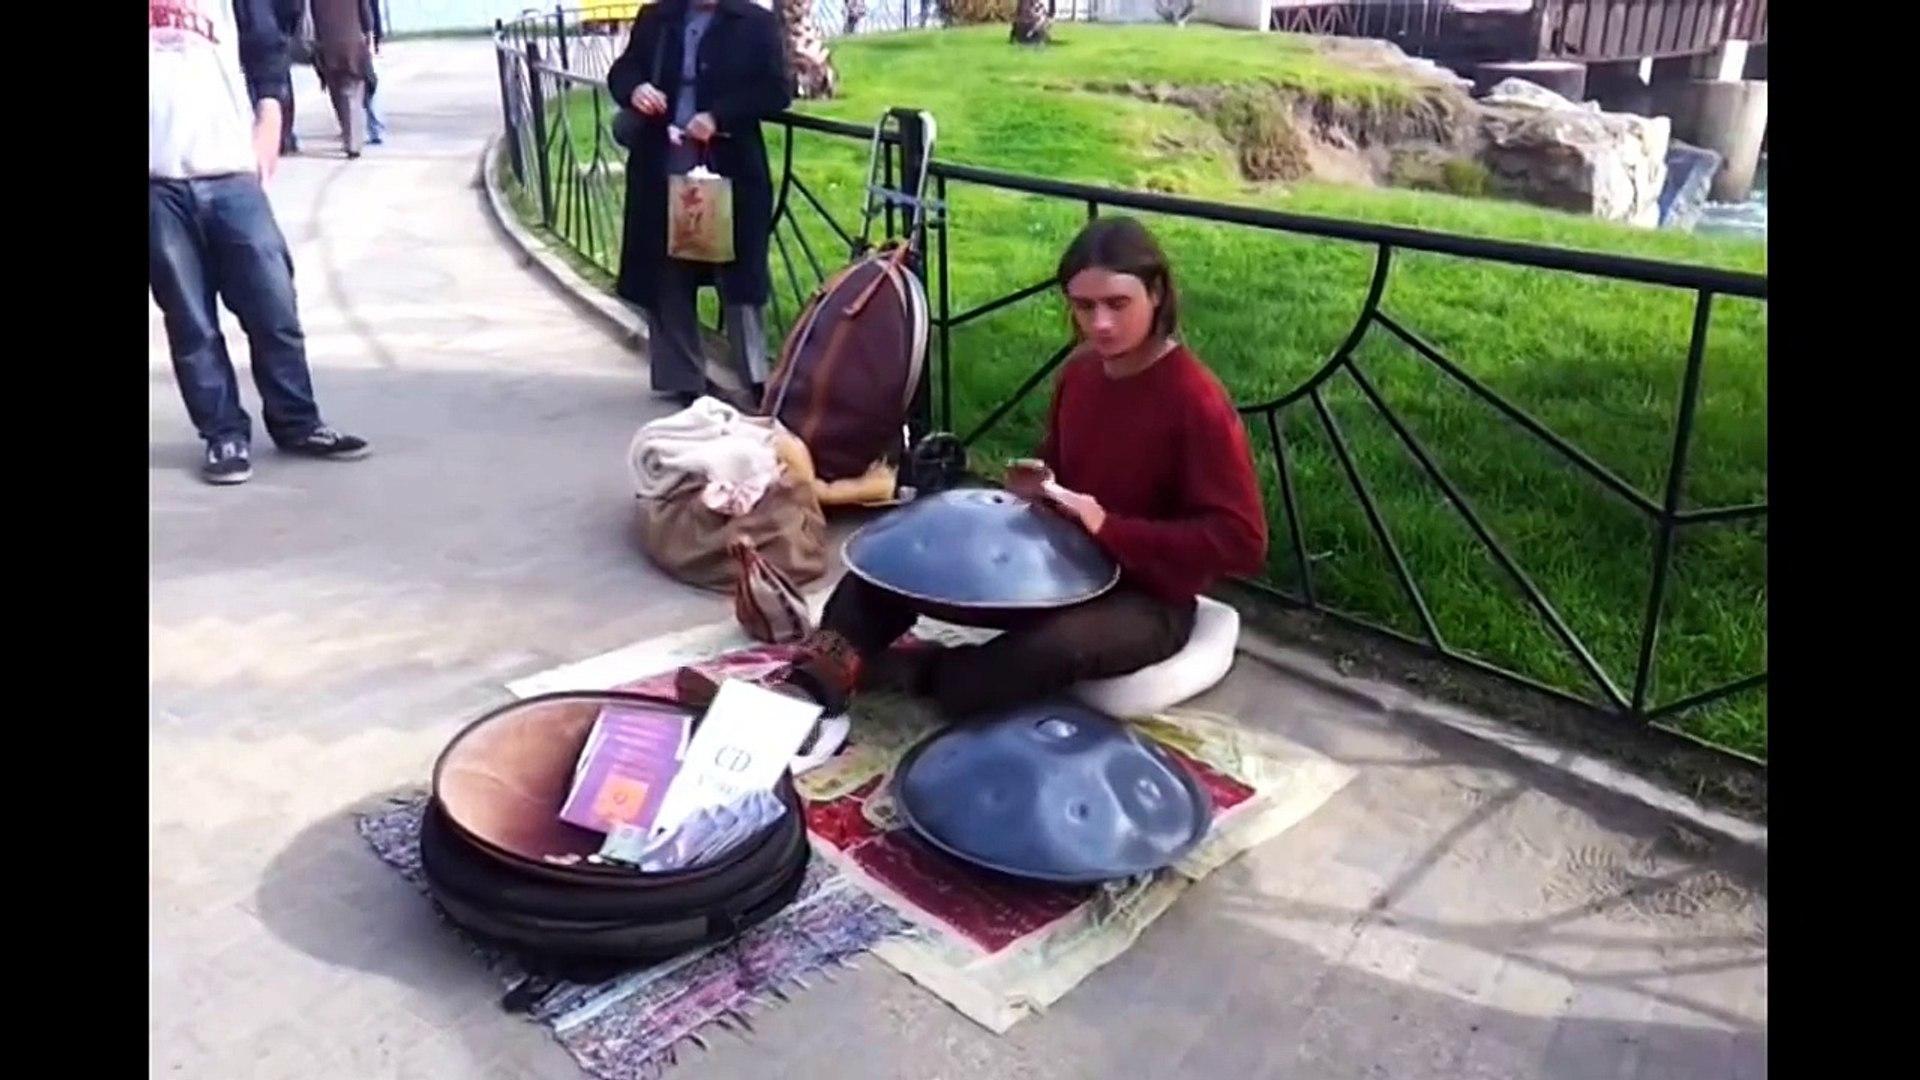 Amazing street musicians part 4: Magic sounds of Hang drum